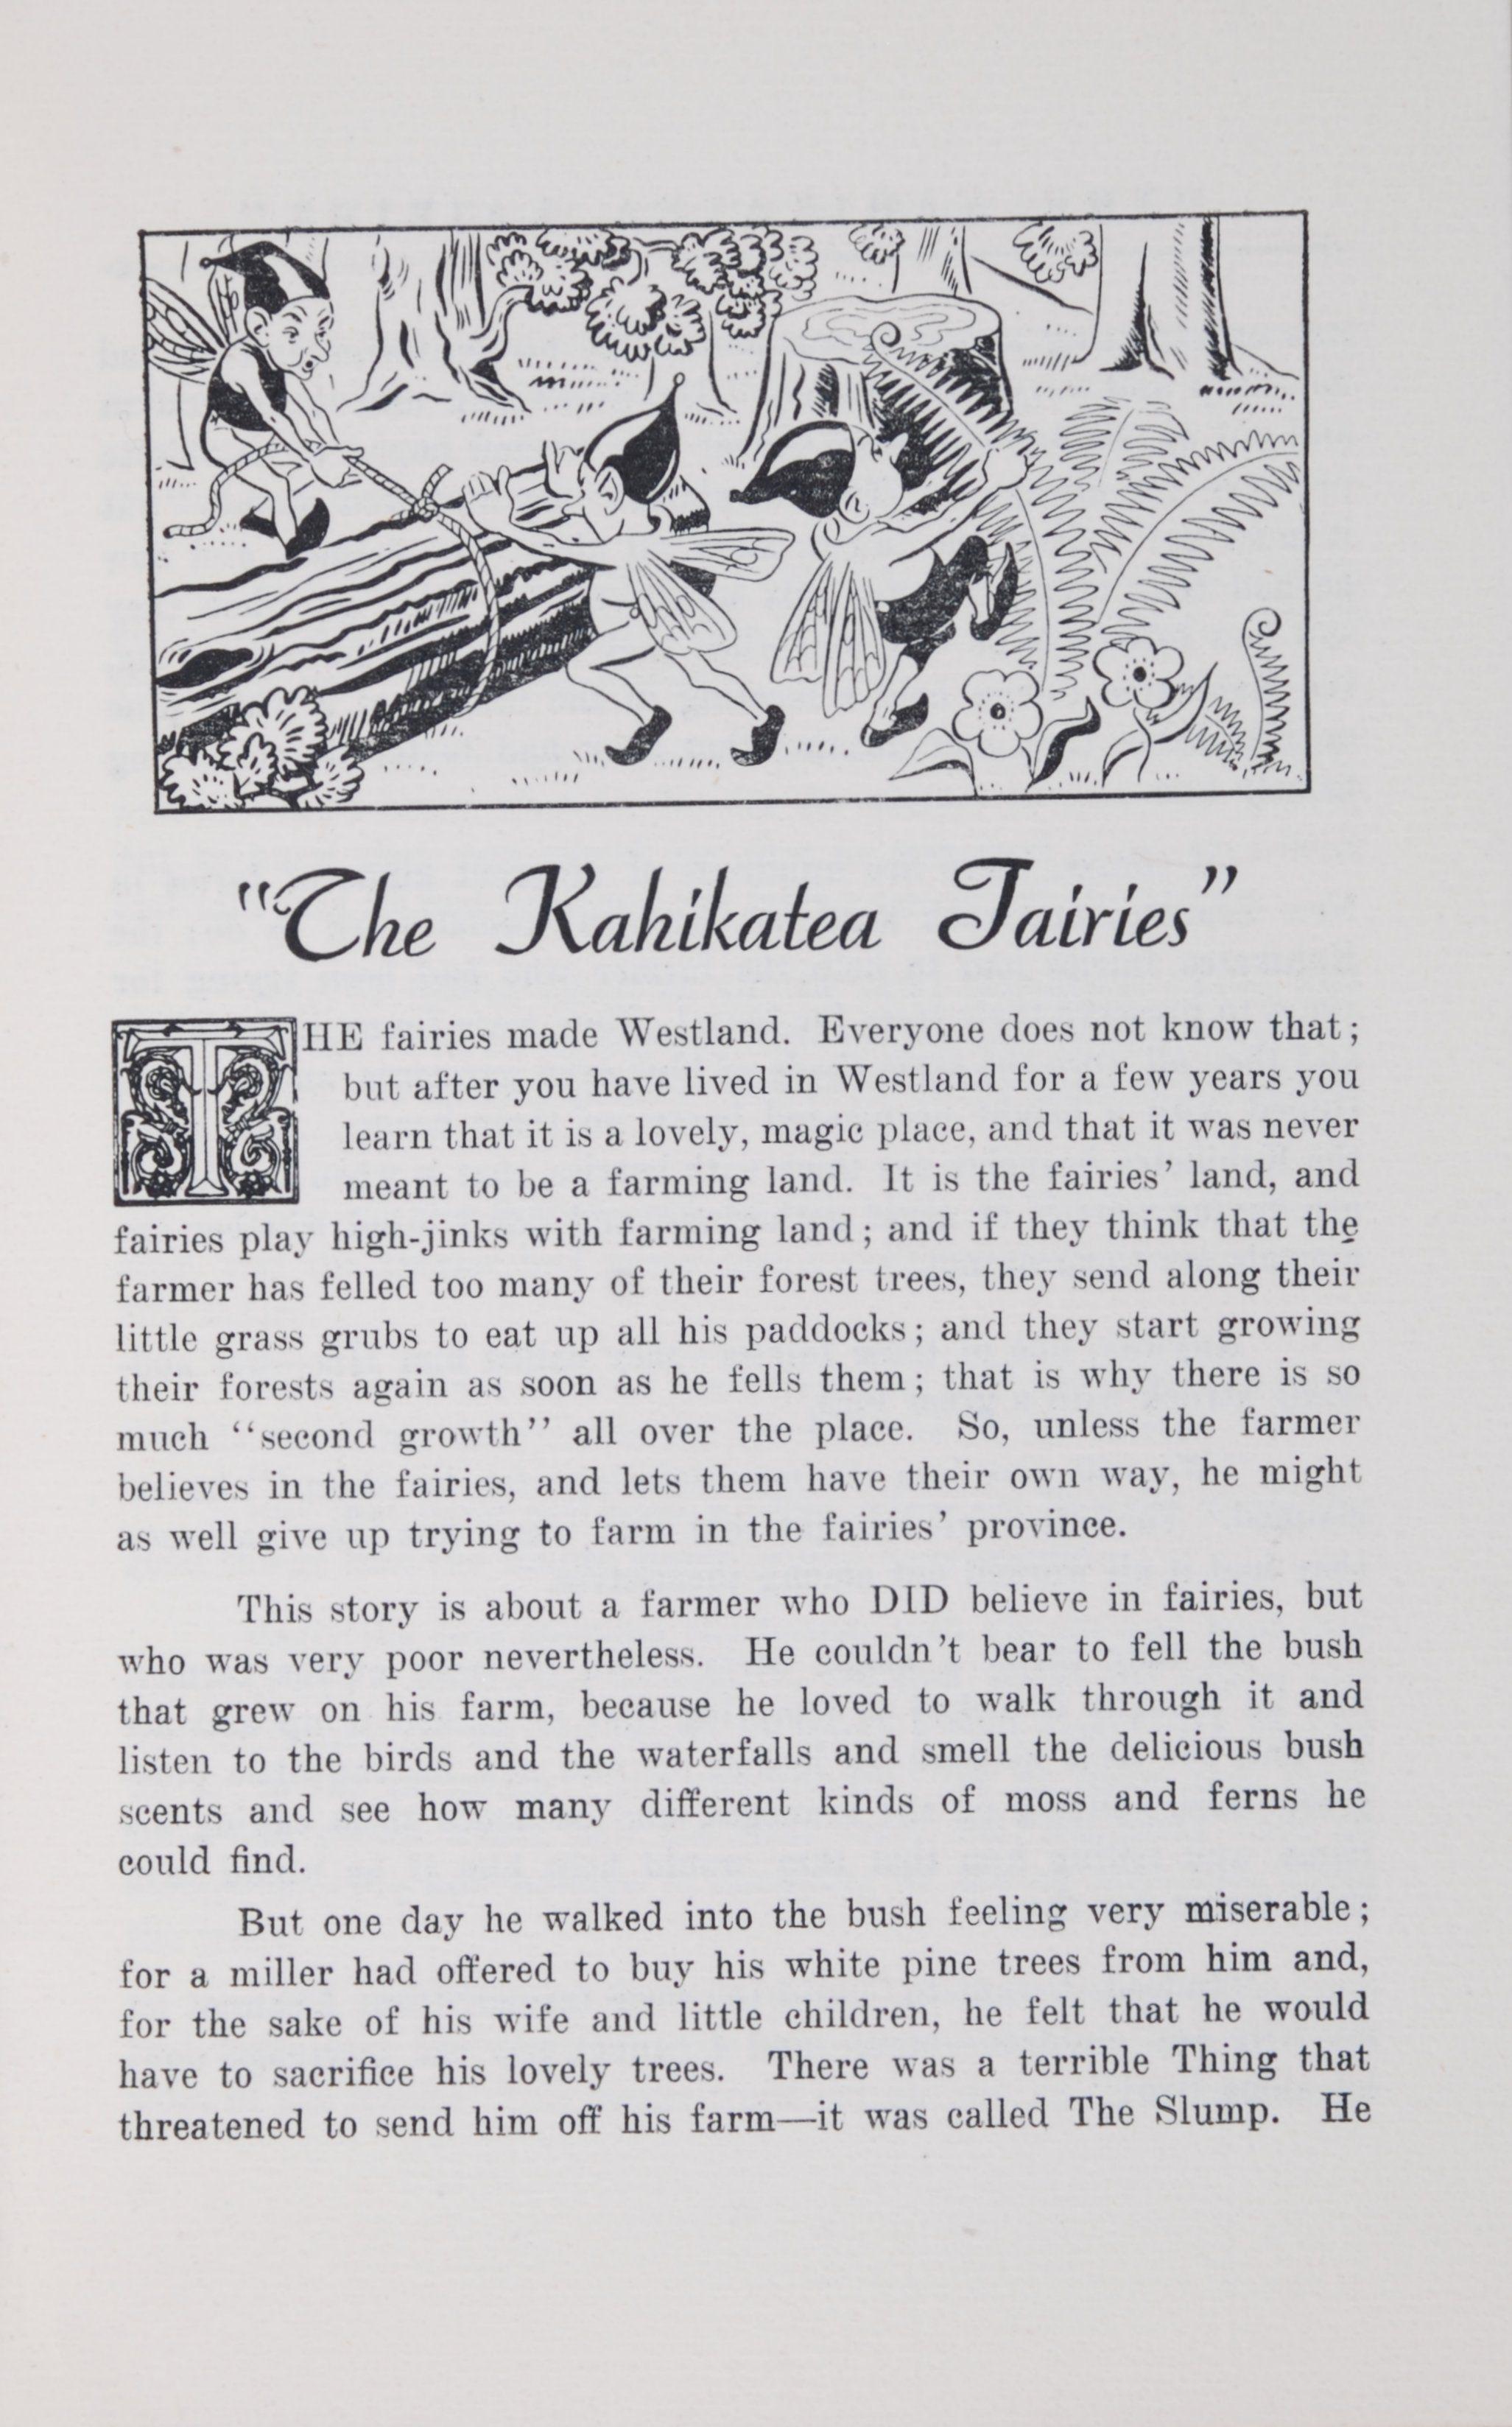 Norah M. Simpson. Fairy tales of Westland. [Greymouth, N.Z.: Greymouth Evening Star Co., 1934?]